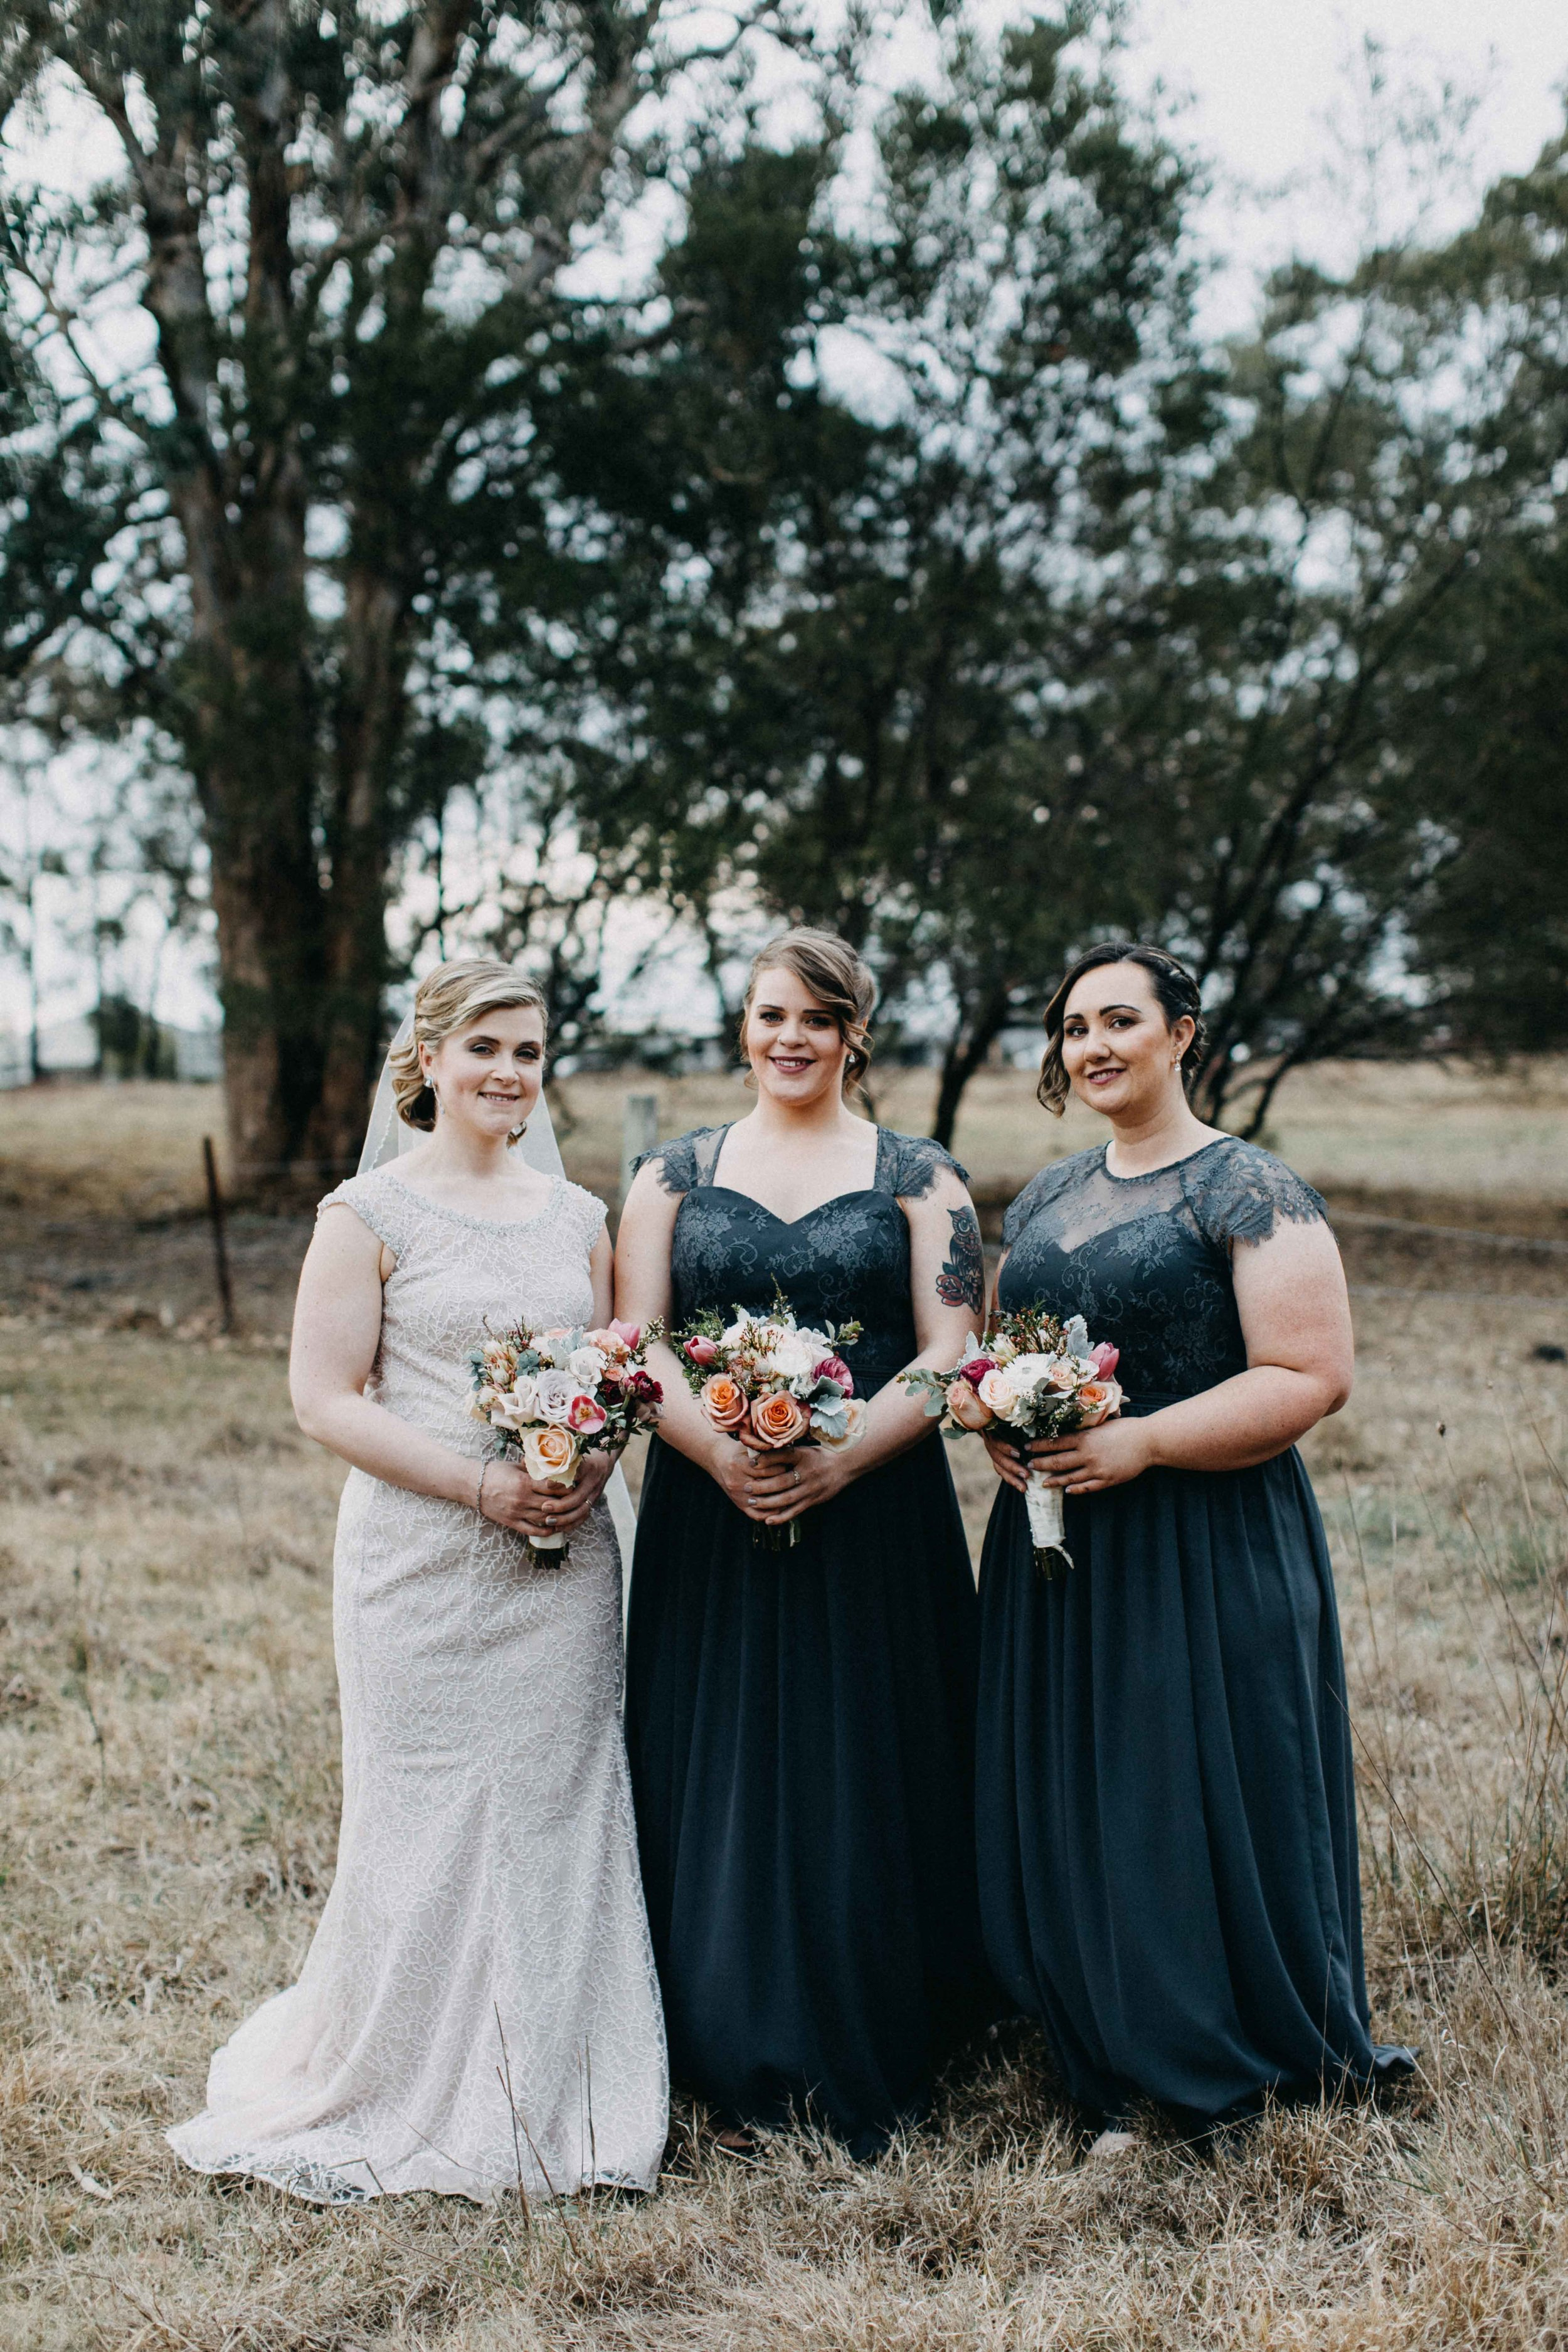 appin-house-wedding-macarthur-www.emilyobrienphotography.net-112.jpg